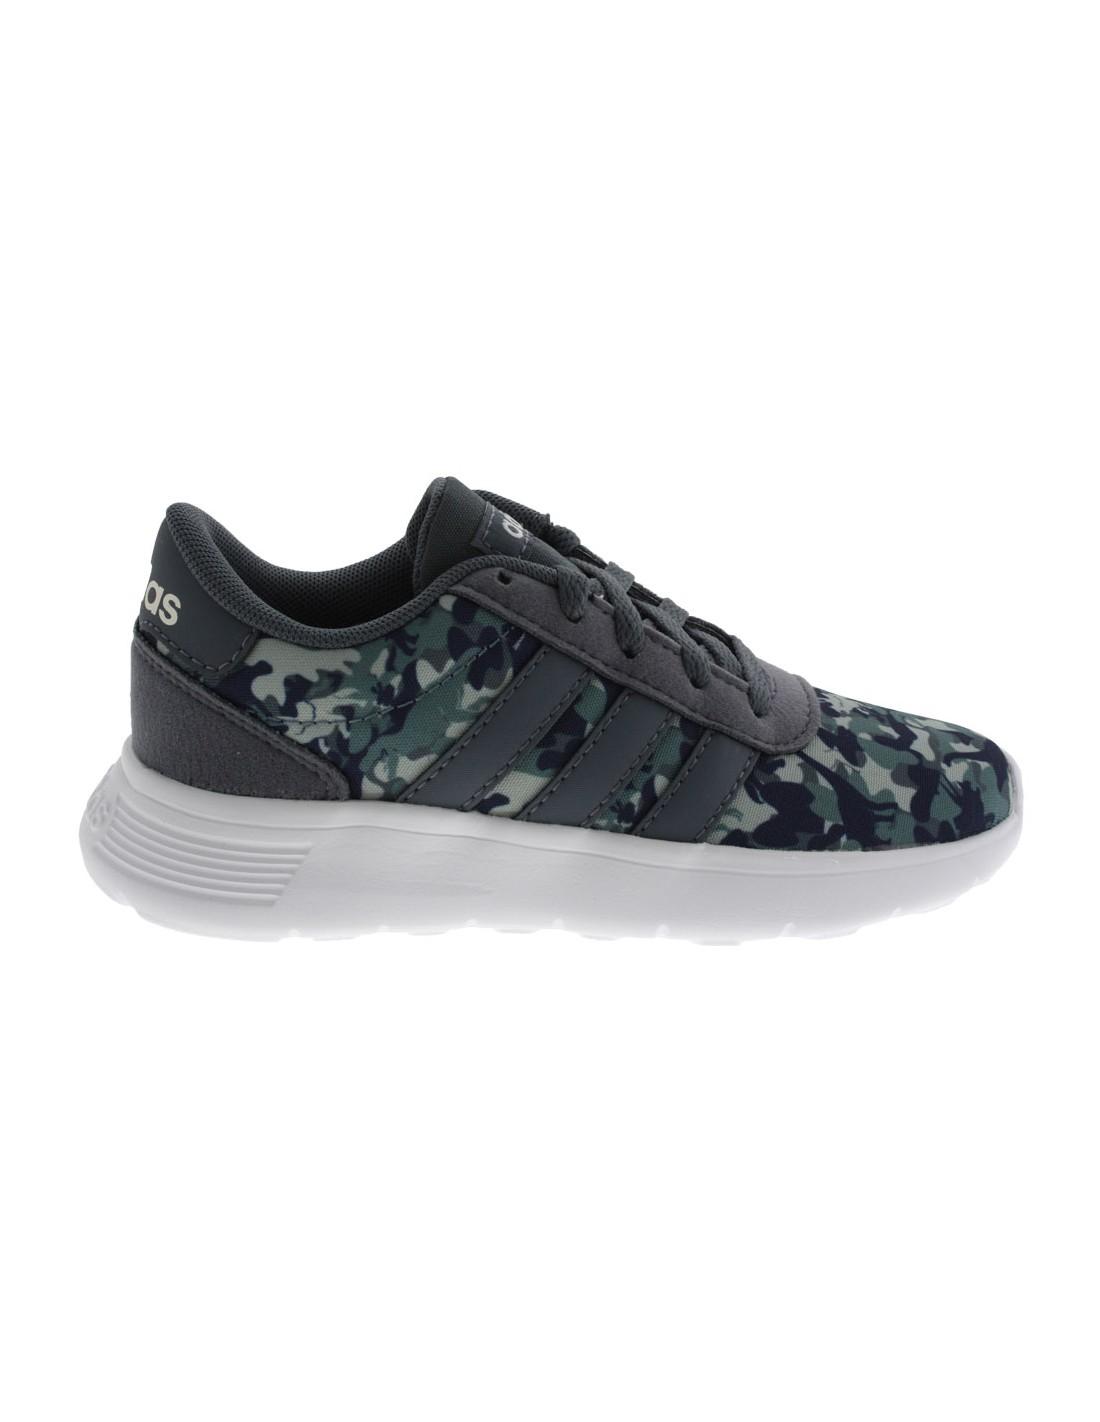 buy online 0b4c3 3101c Scarpe Adidas Lite Racer K bambino grigio scuro